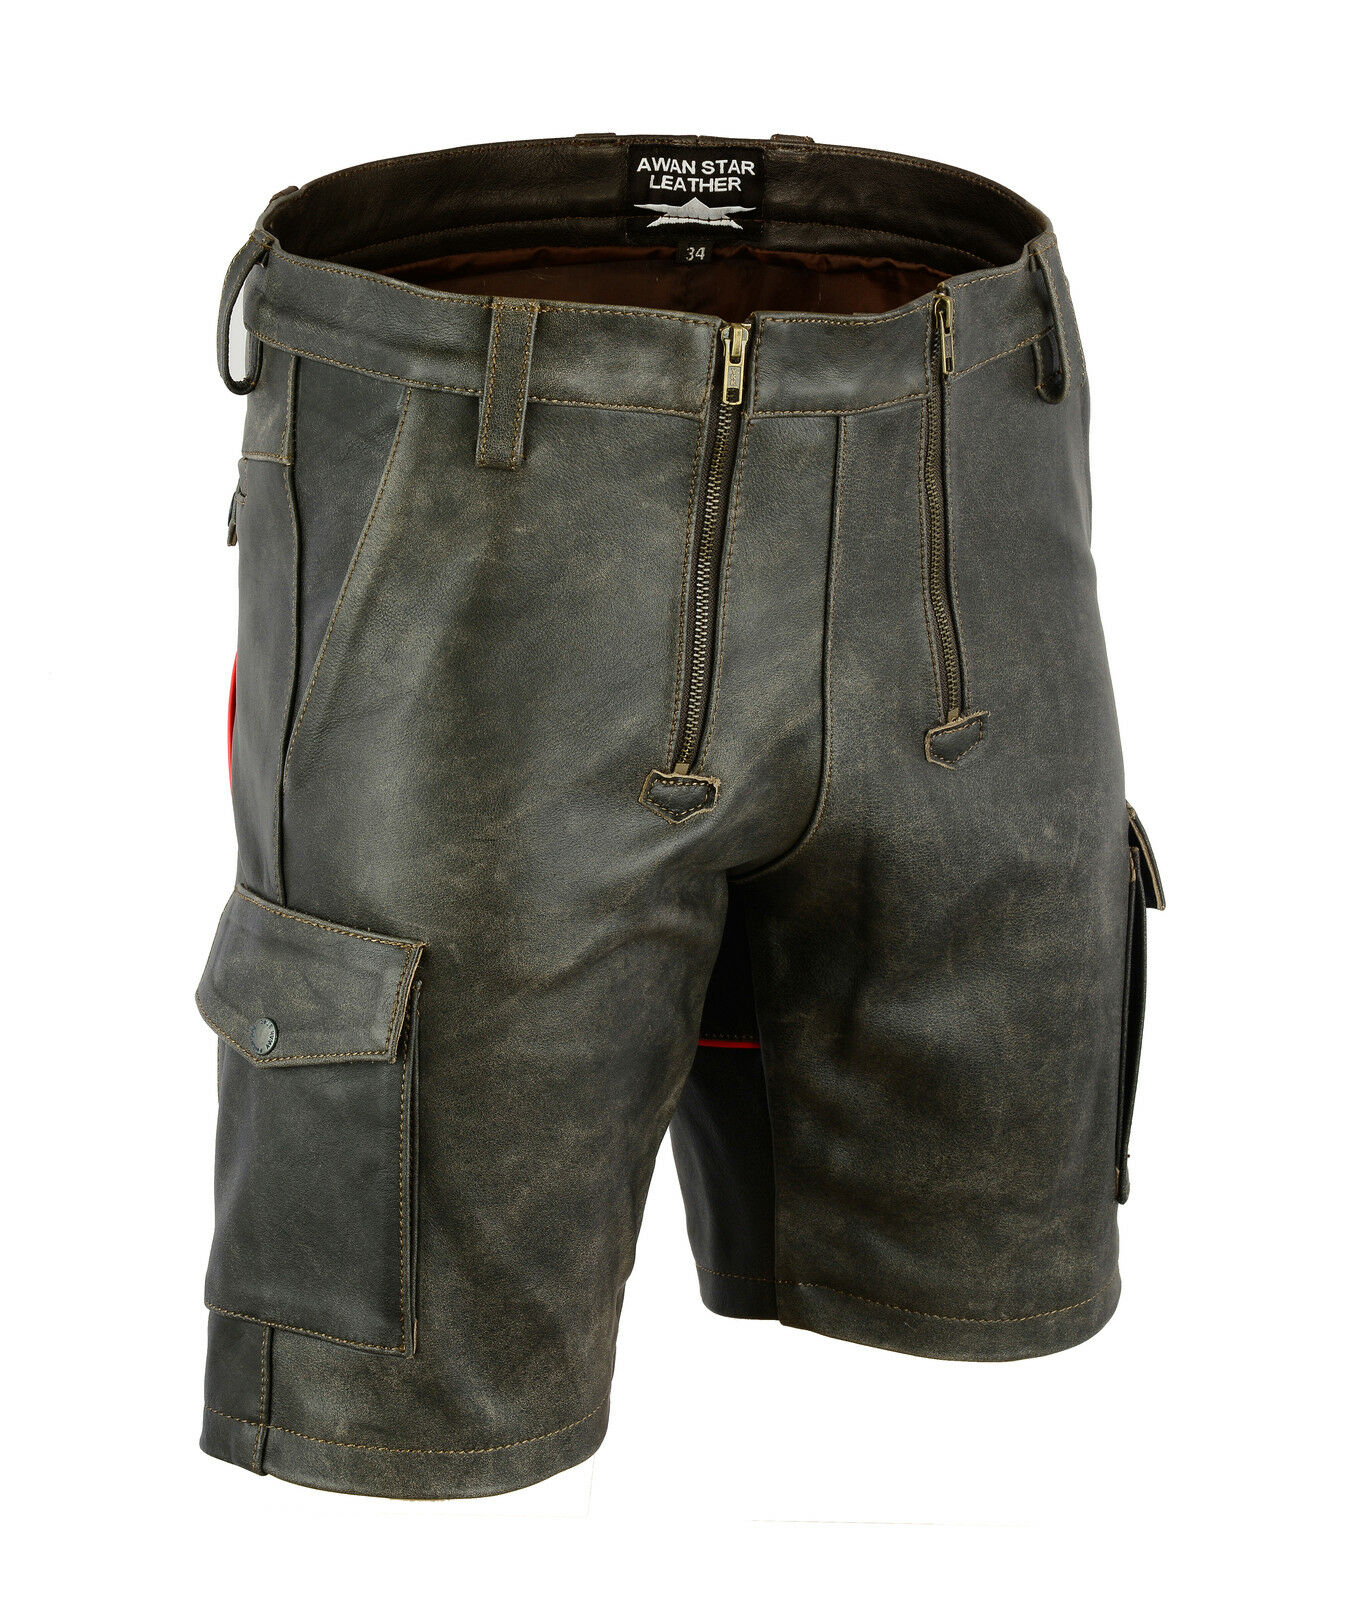 Aw7525 PELLE VINTAGE carpentiere Shorts,Pantaloncini Shorts,Pantaloncini Shorts,Pantaloncini MILITARI,Zimmermann bc471f